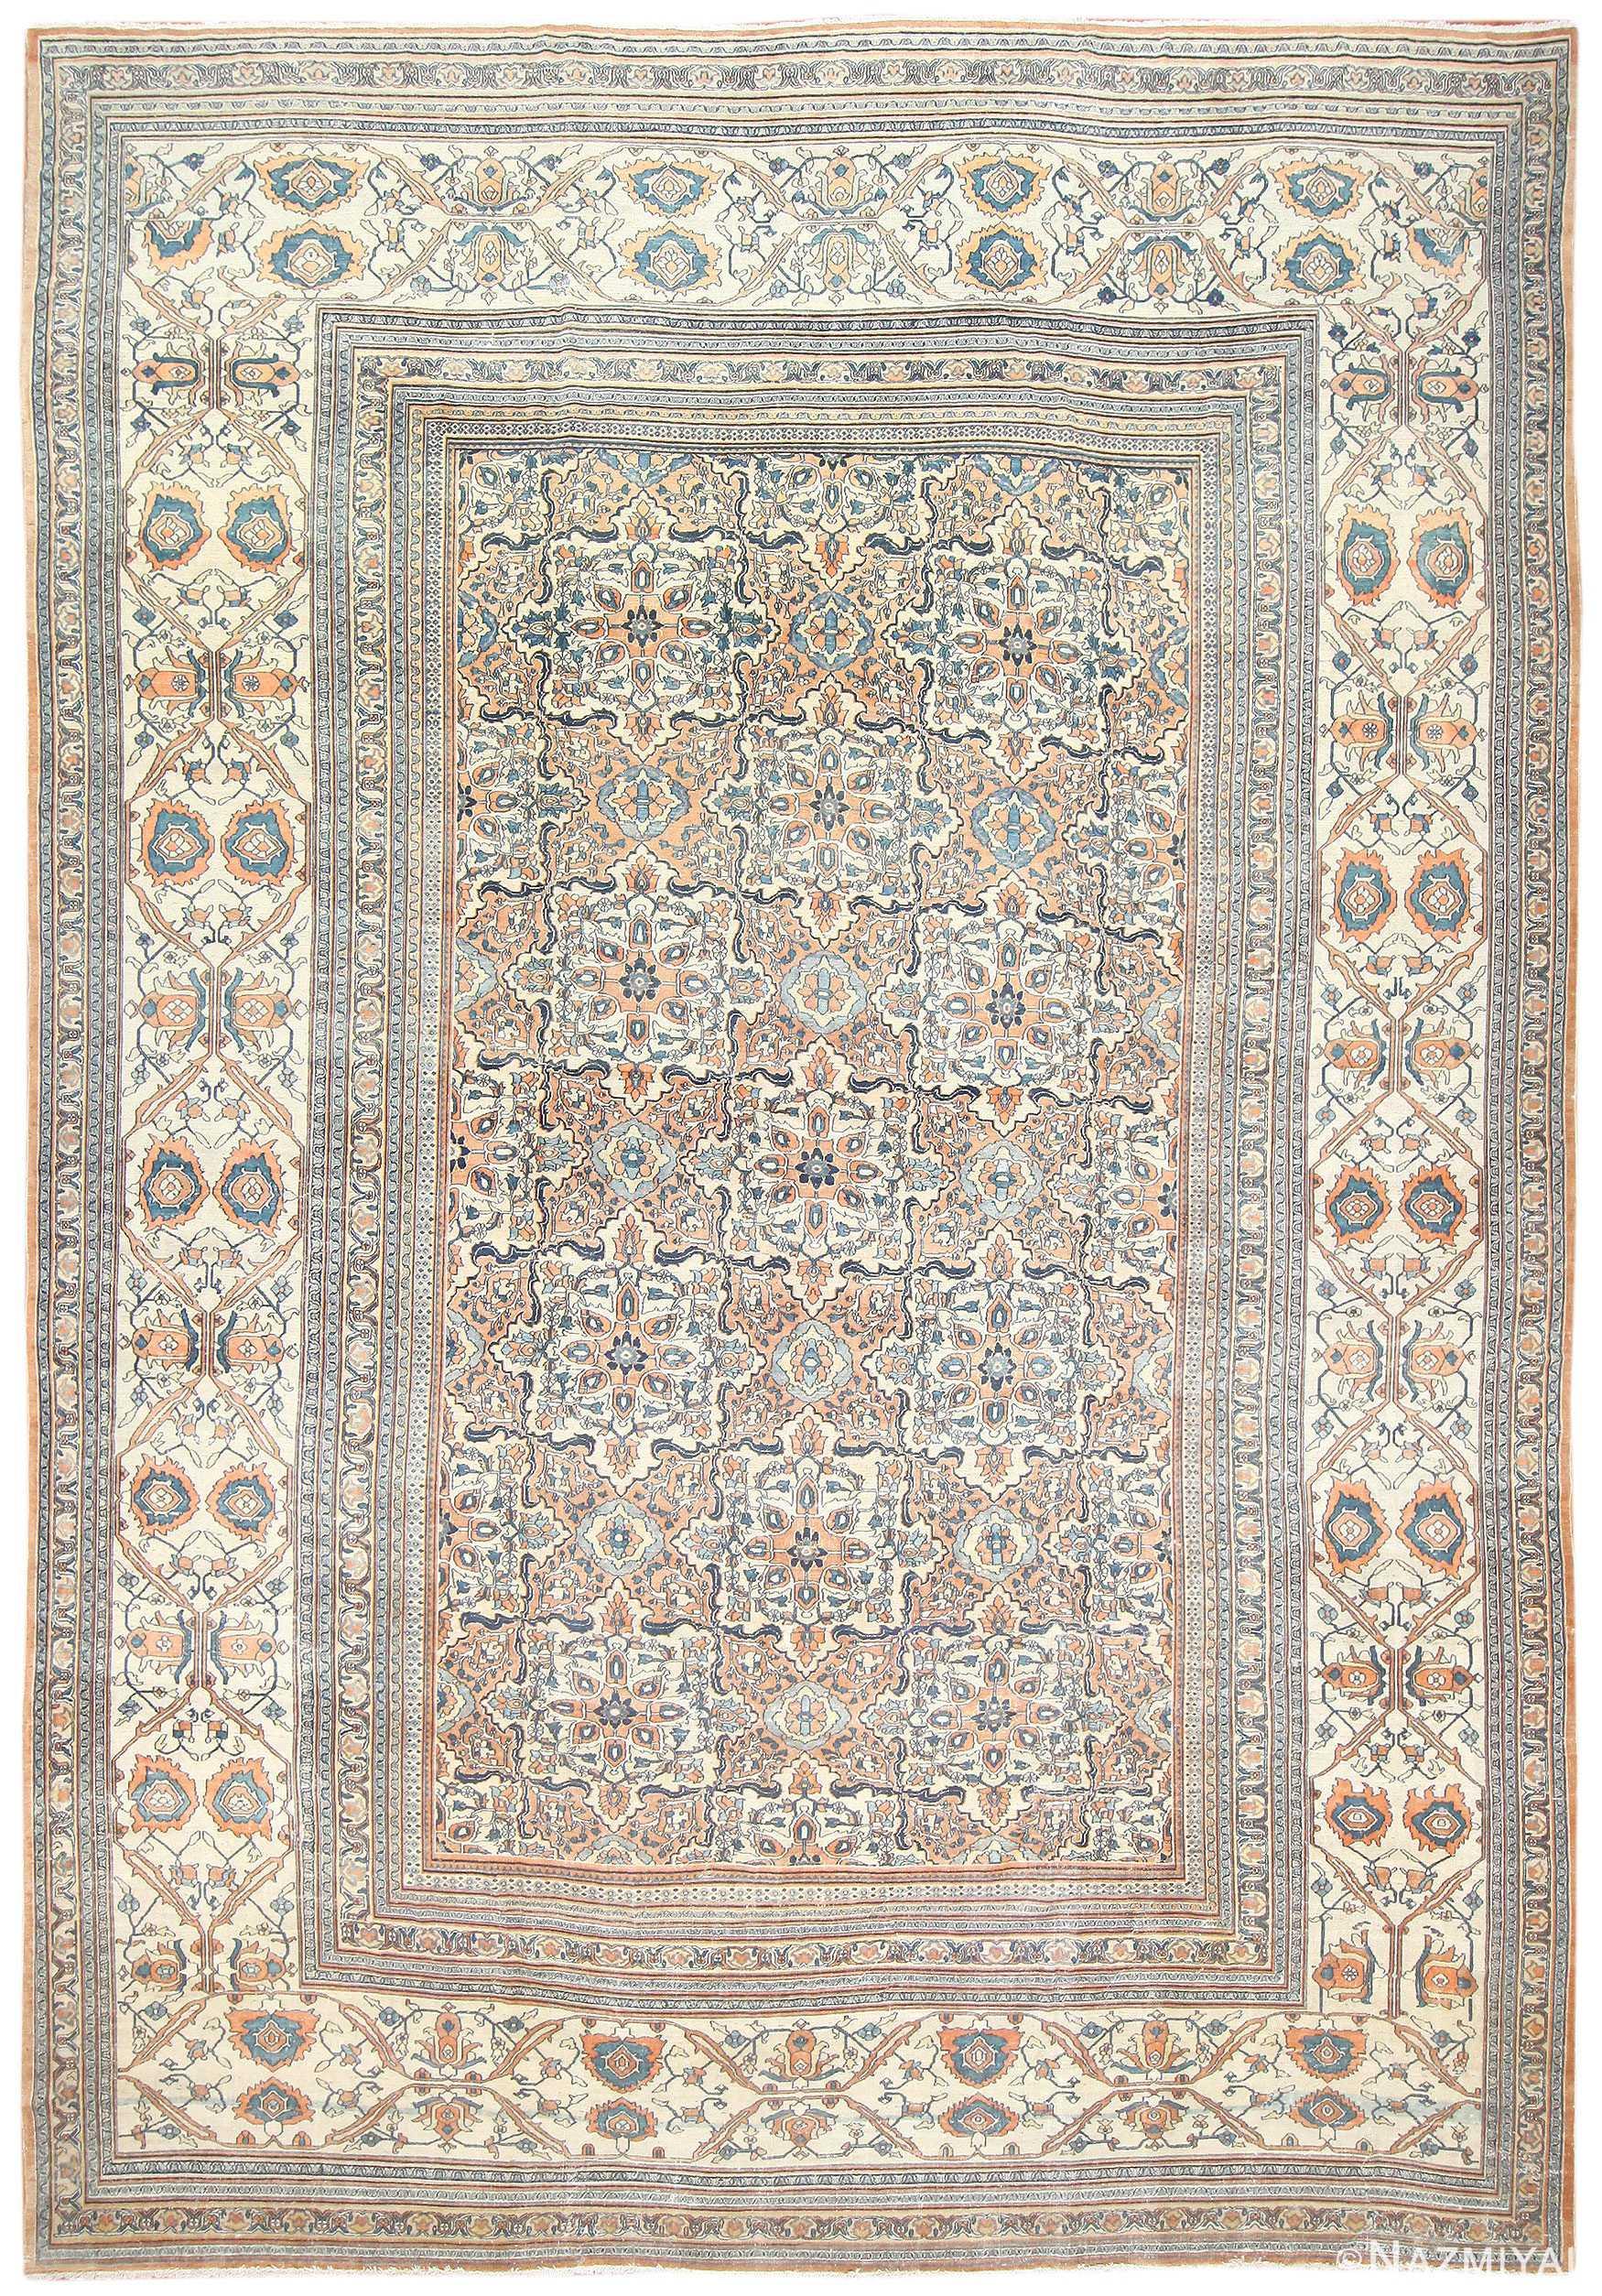 Antique Persian Khorassan Carpet 50017 Large Image